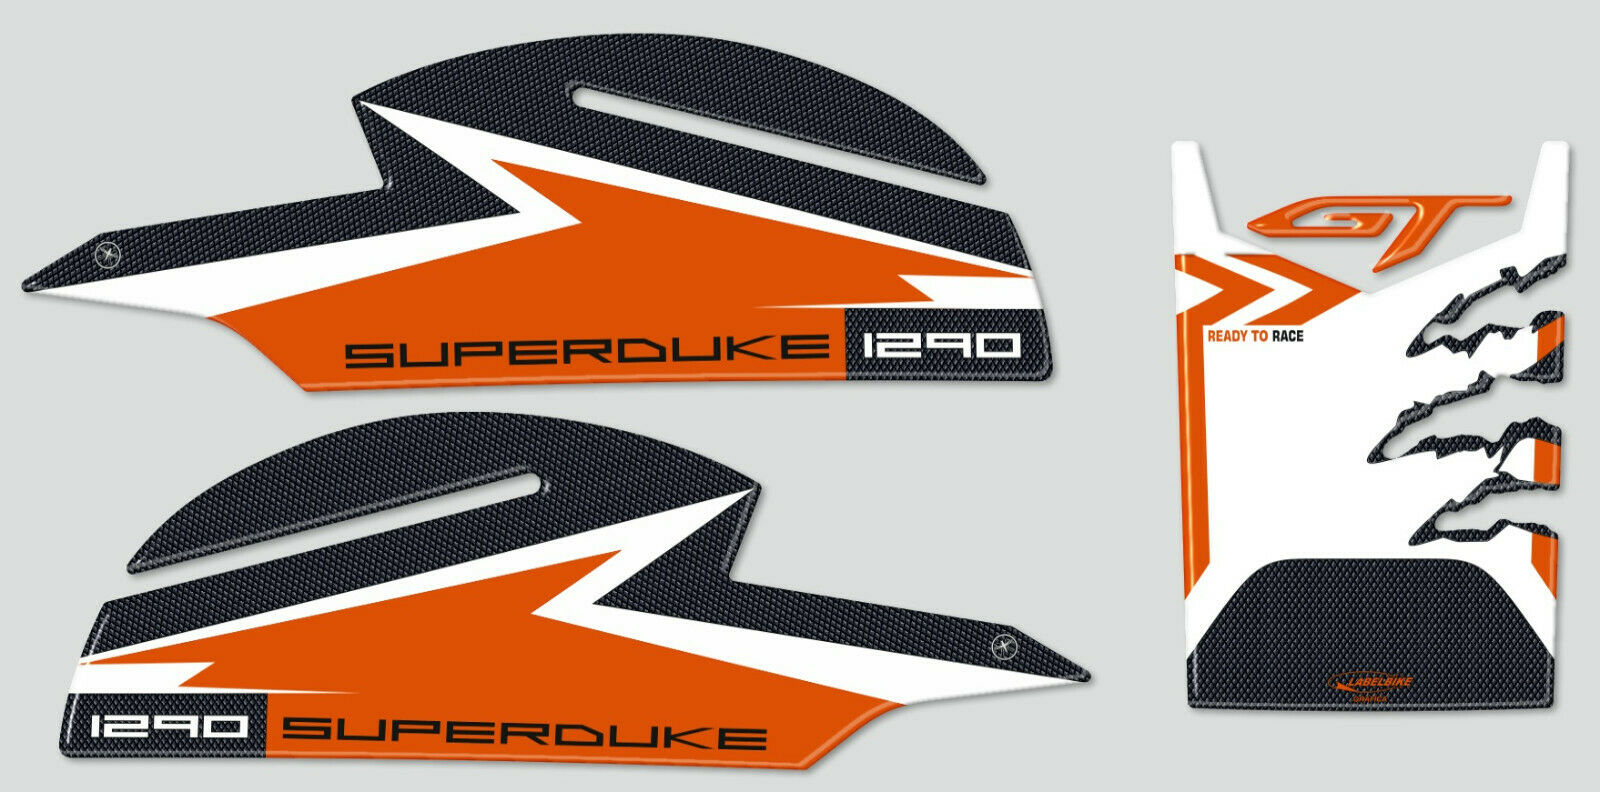 TANK PAD STICKER RESINED BLACK ORANGE FITS KTM 1290 SUPERDUKE R 2017-2019